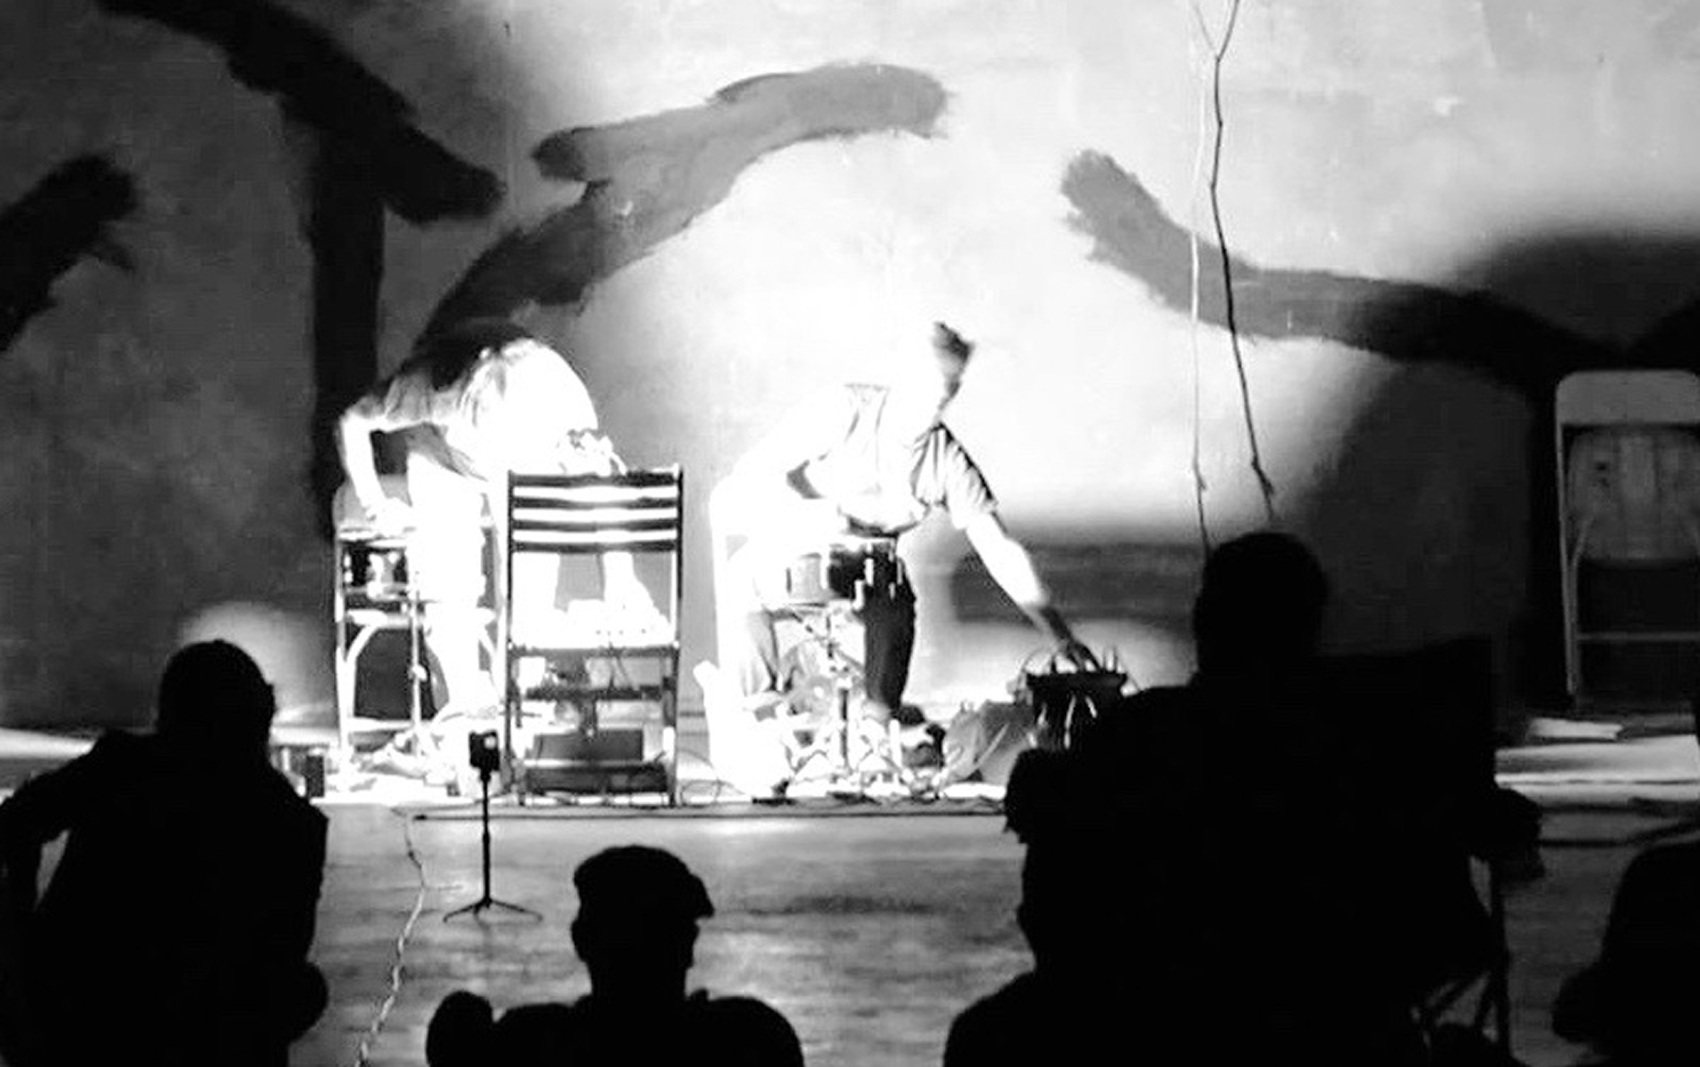 DROPA DICS LABEL NIGHT – JEPH JERMAN AND TIME BARNES – ILTA HÄMÄRÄ COMING UP !